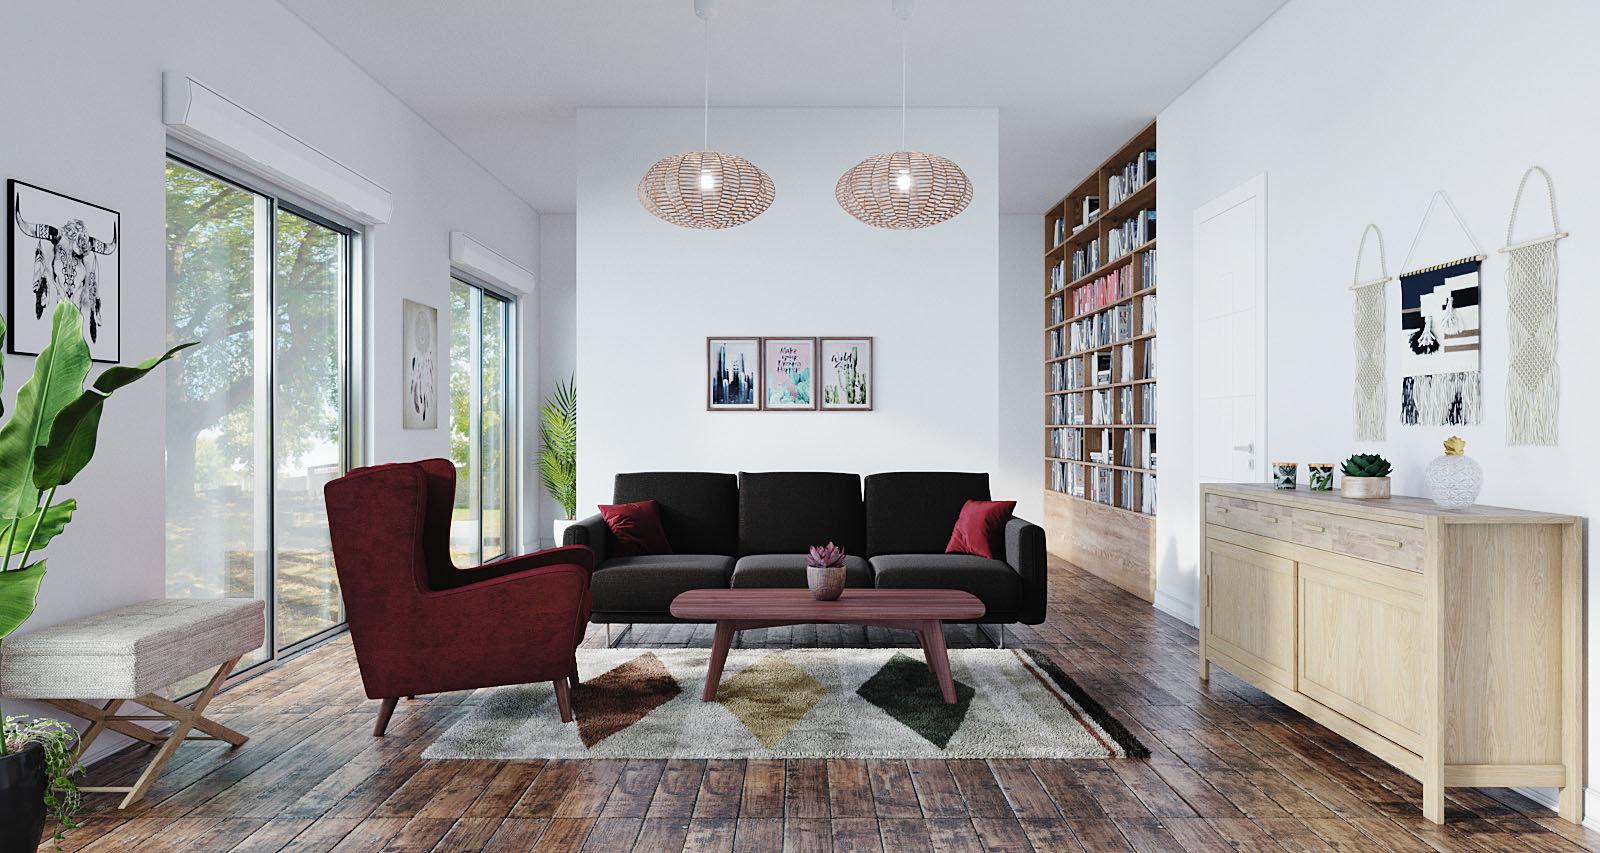 Salon scandinave nature blanc rouge marron: inspiration style Scandinave